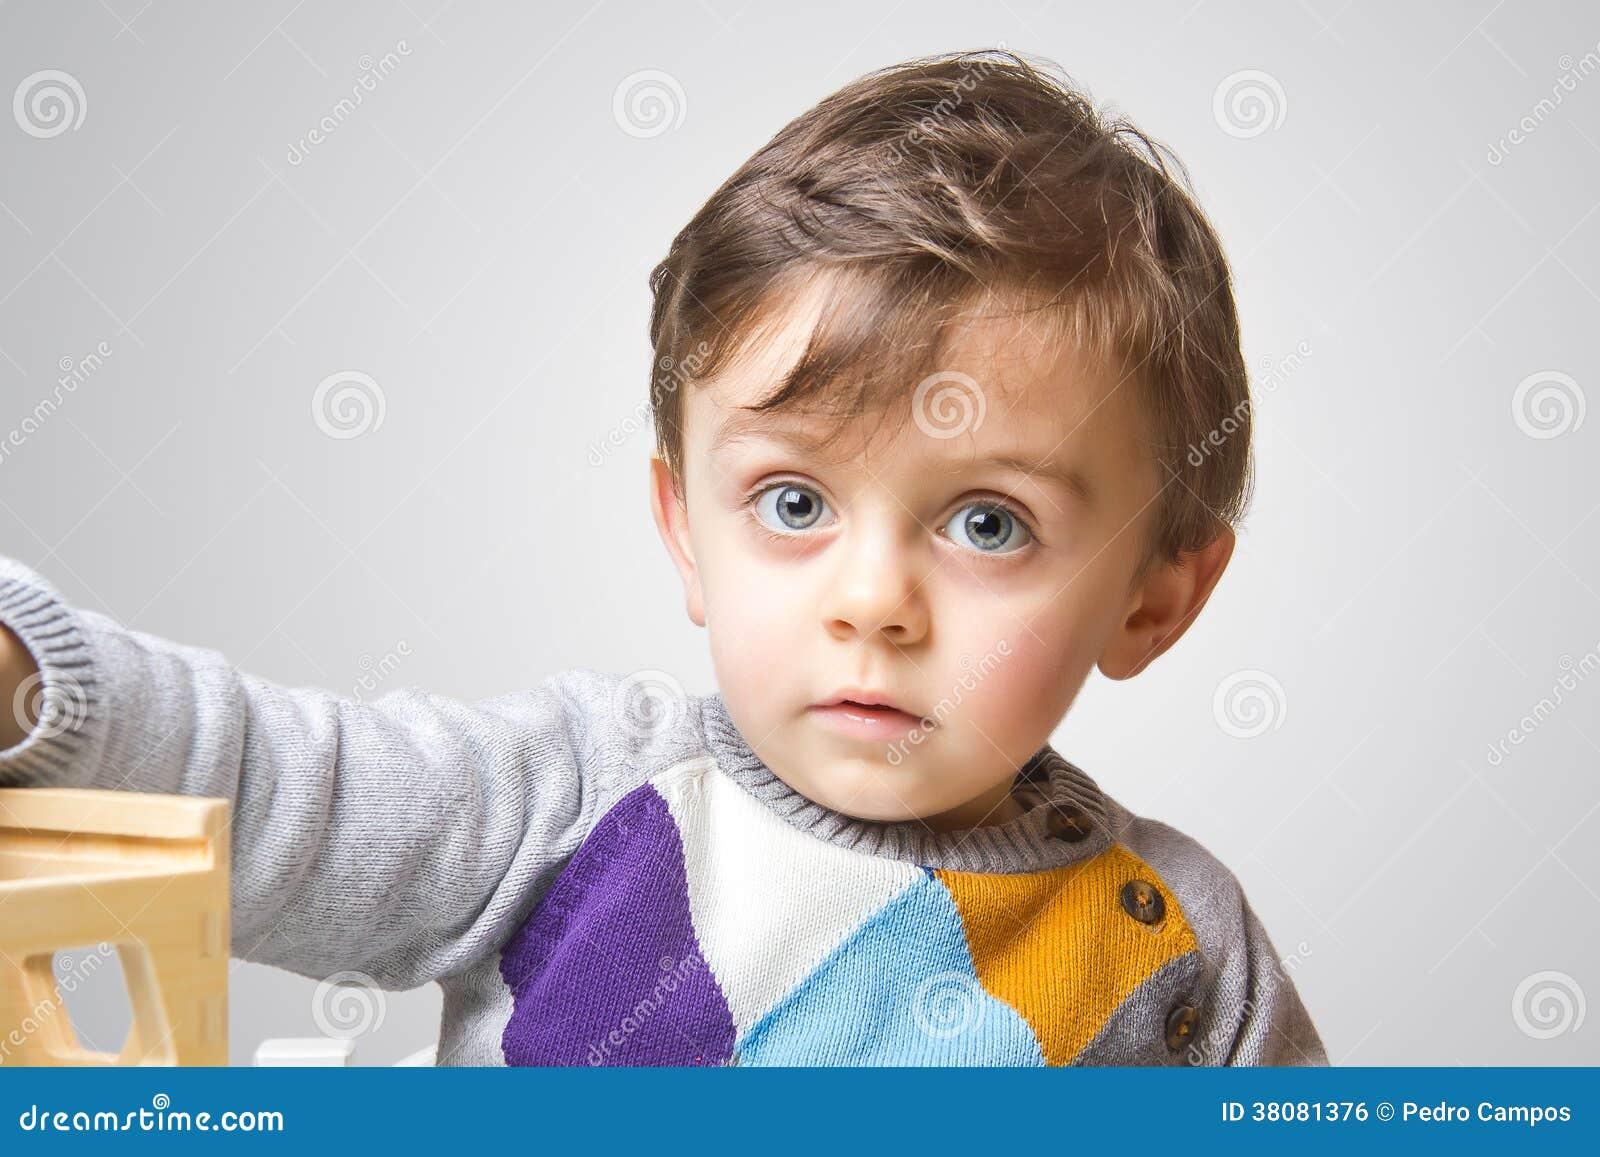 Child staring at the camera